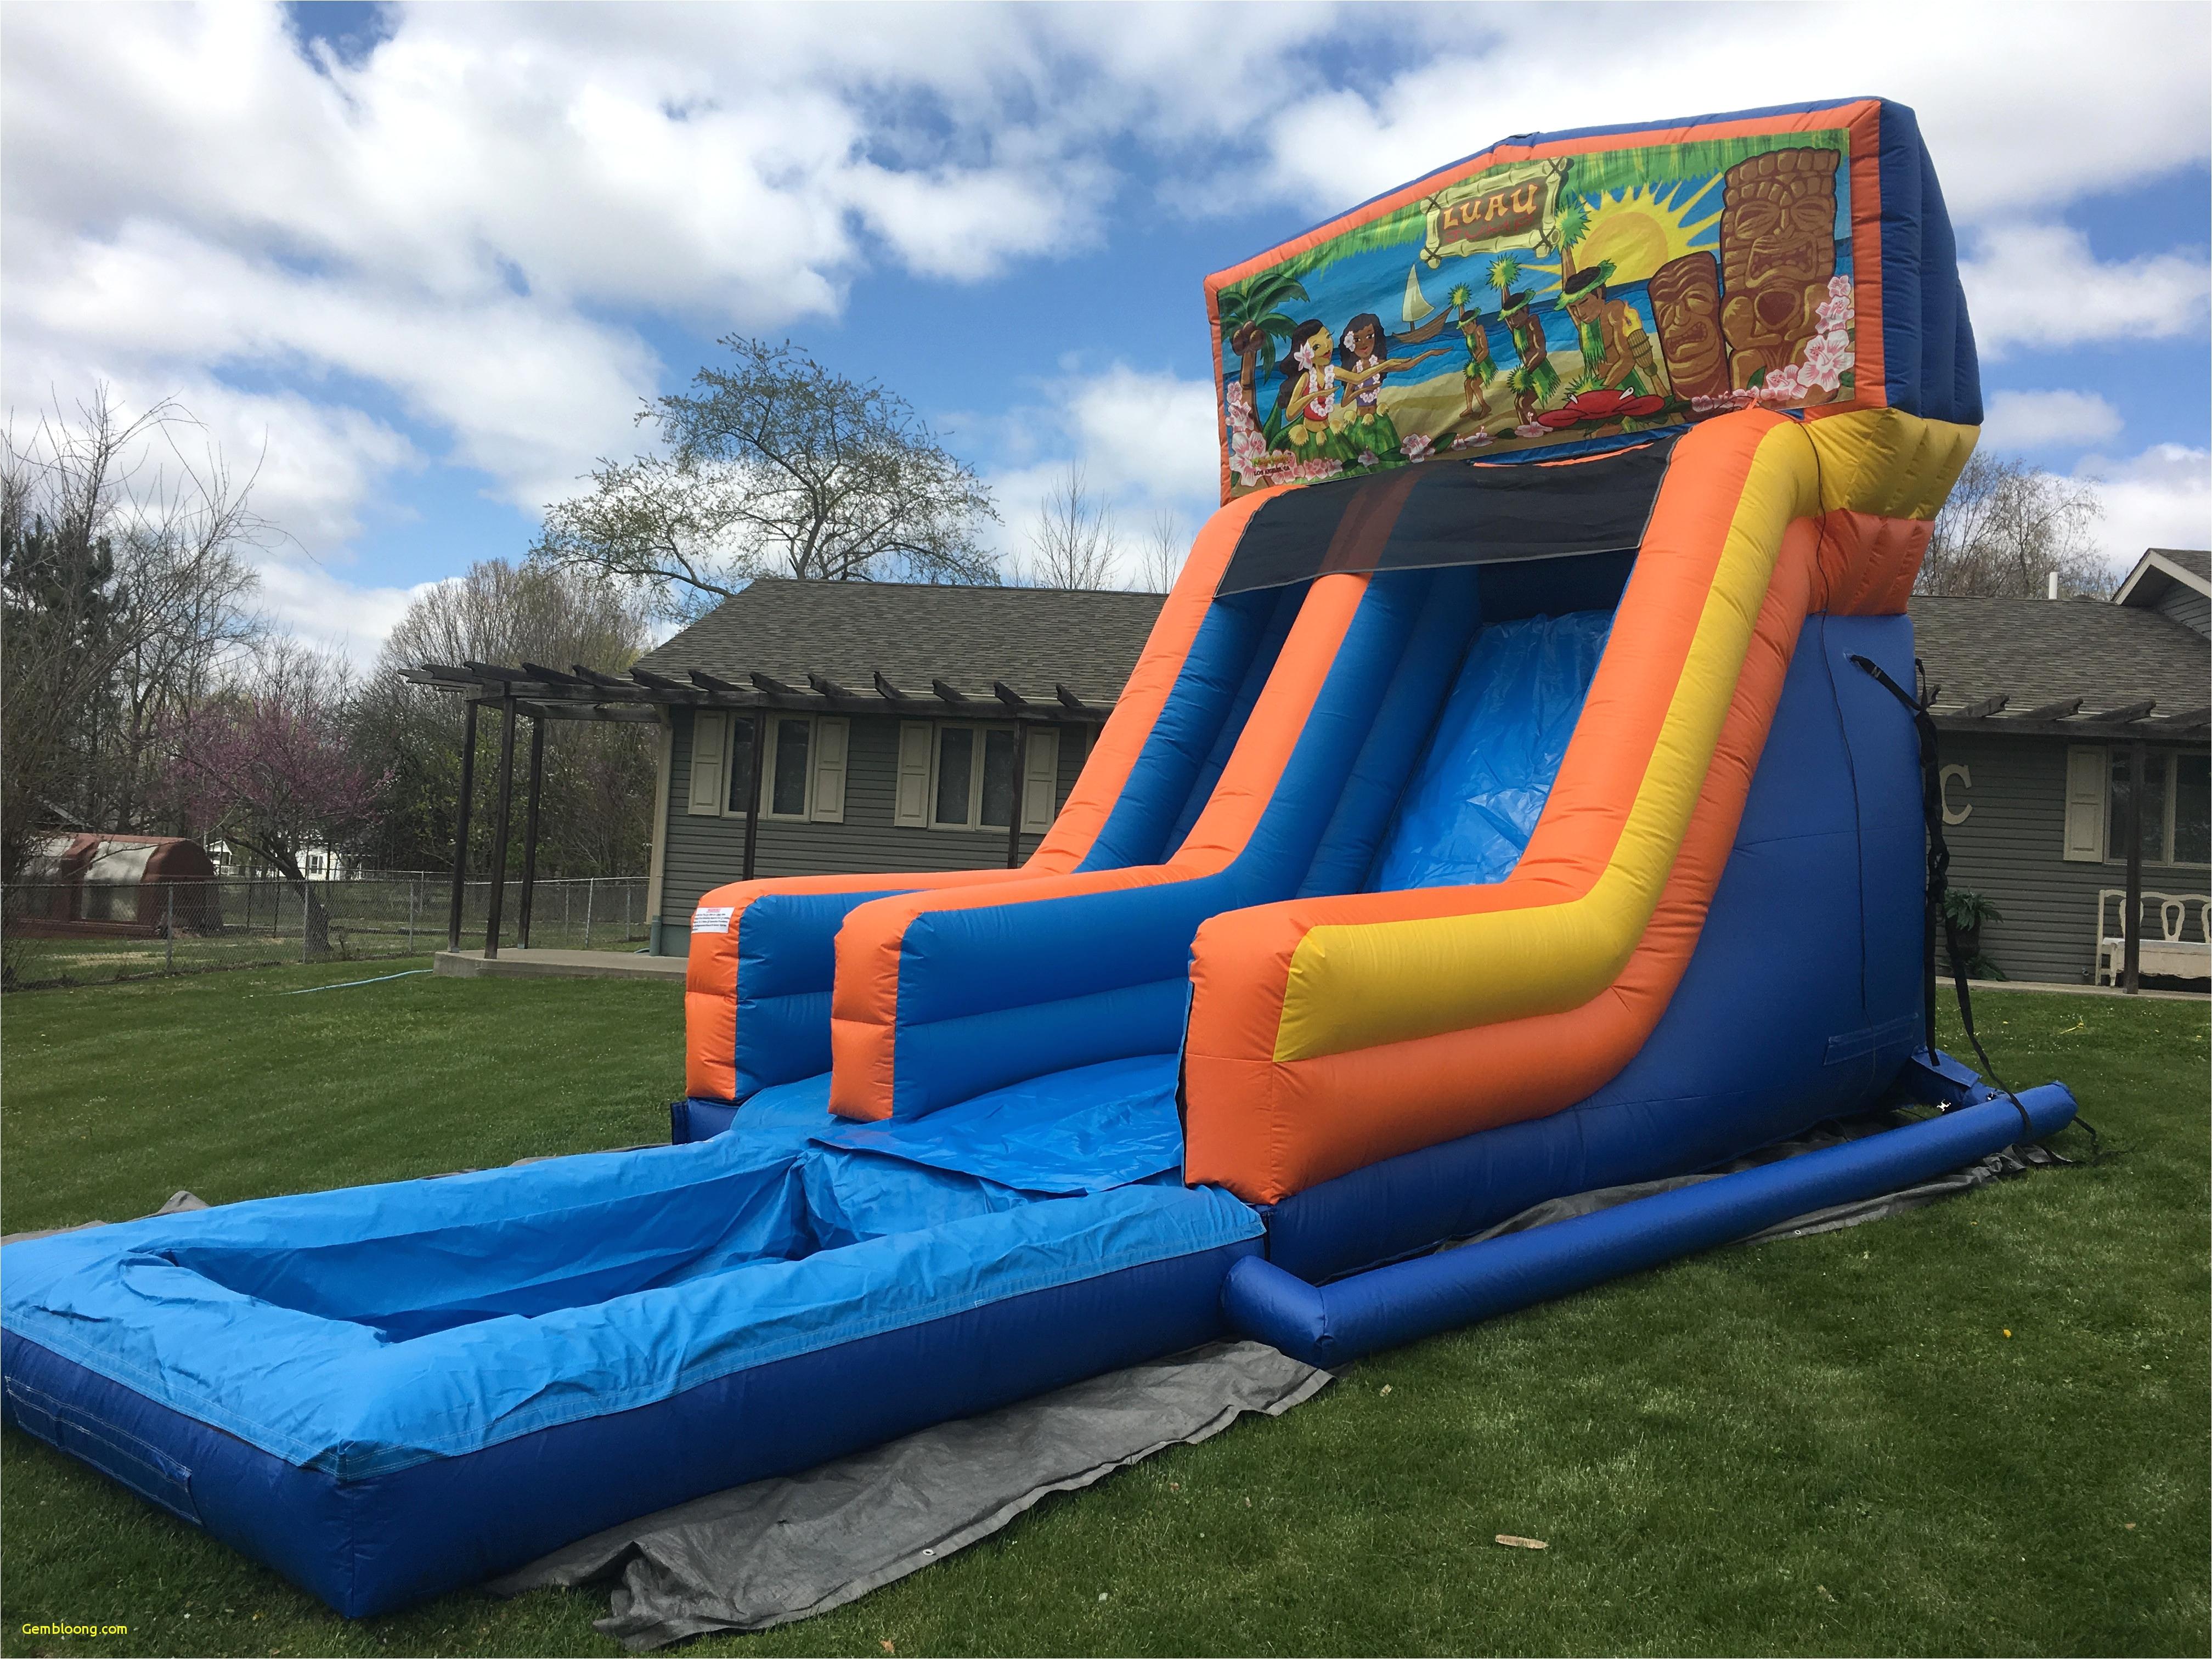 Best Backyard Water Slide Water Slides for Your Backyard Awesome Water Slides for Your